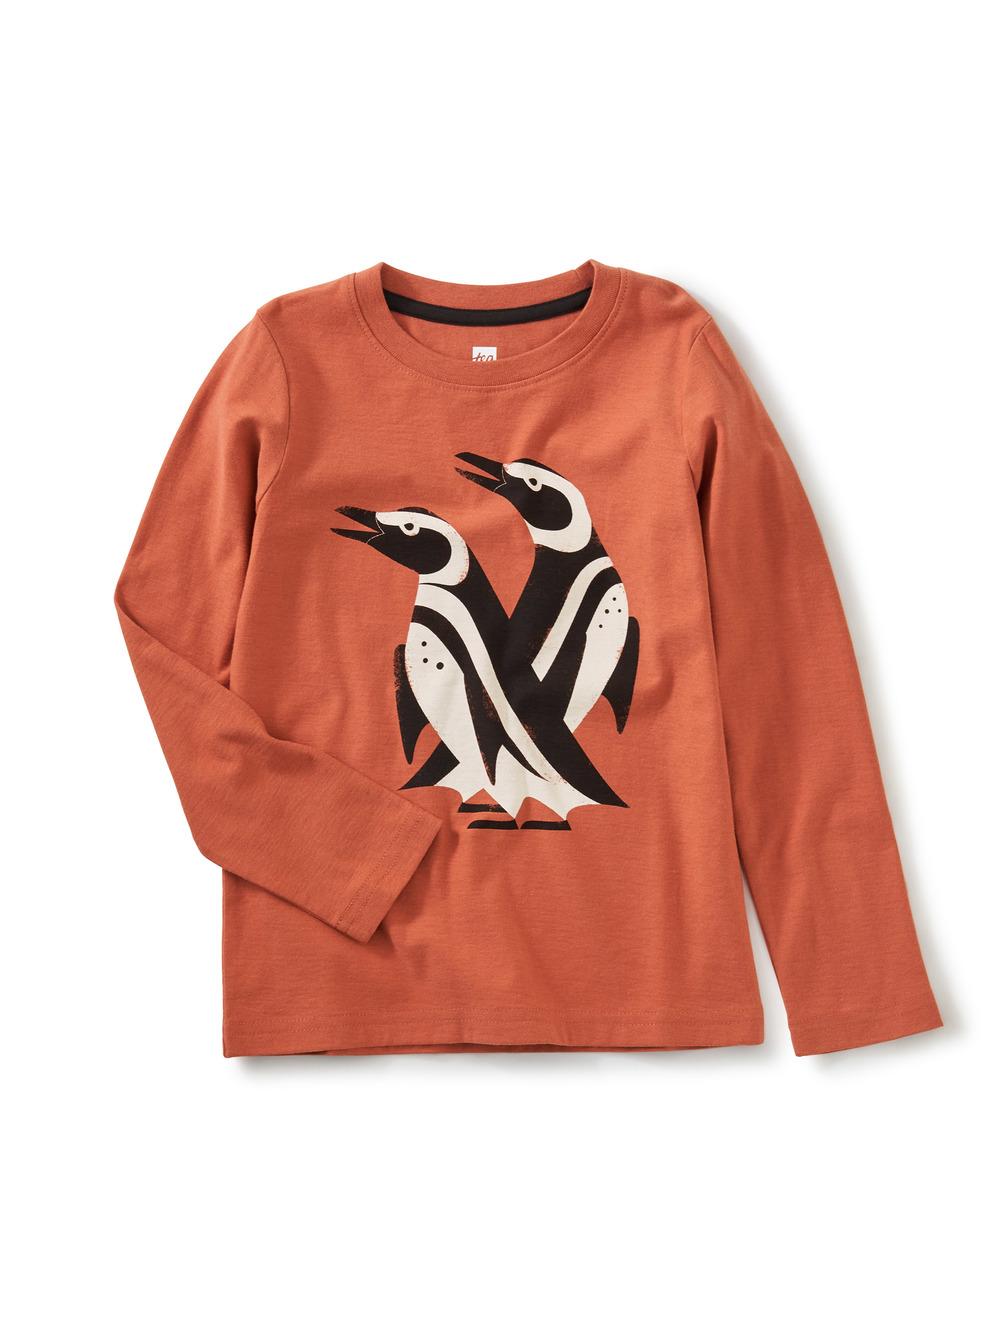 Patagonia Penguin Graphic Tee